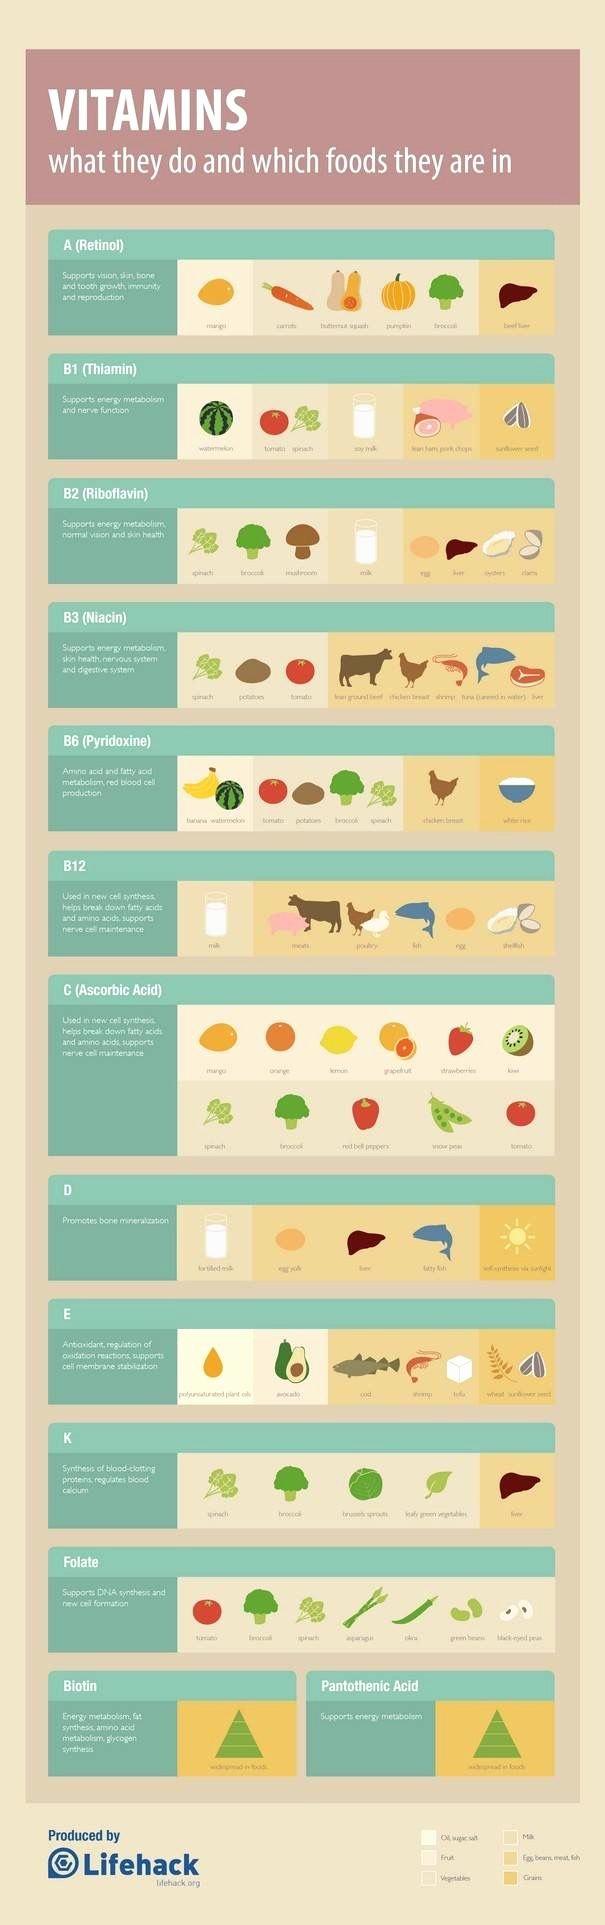 Vitamin Water Cheat Sheet Beautiful 12 Best Vegan High In Calcium Foods Images On Pinterest